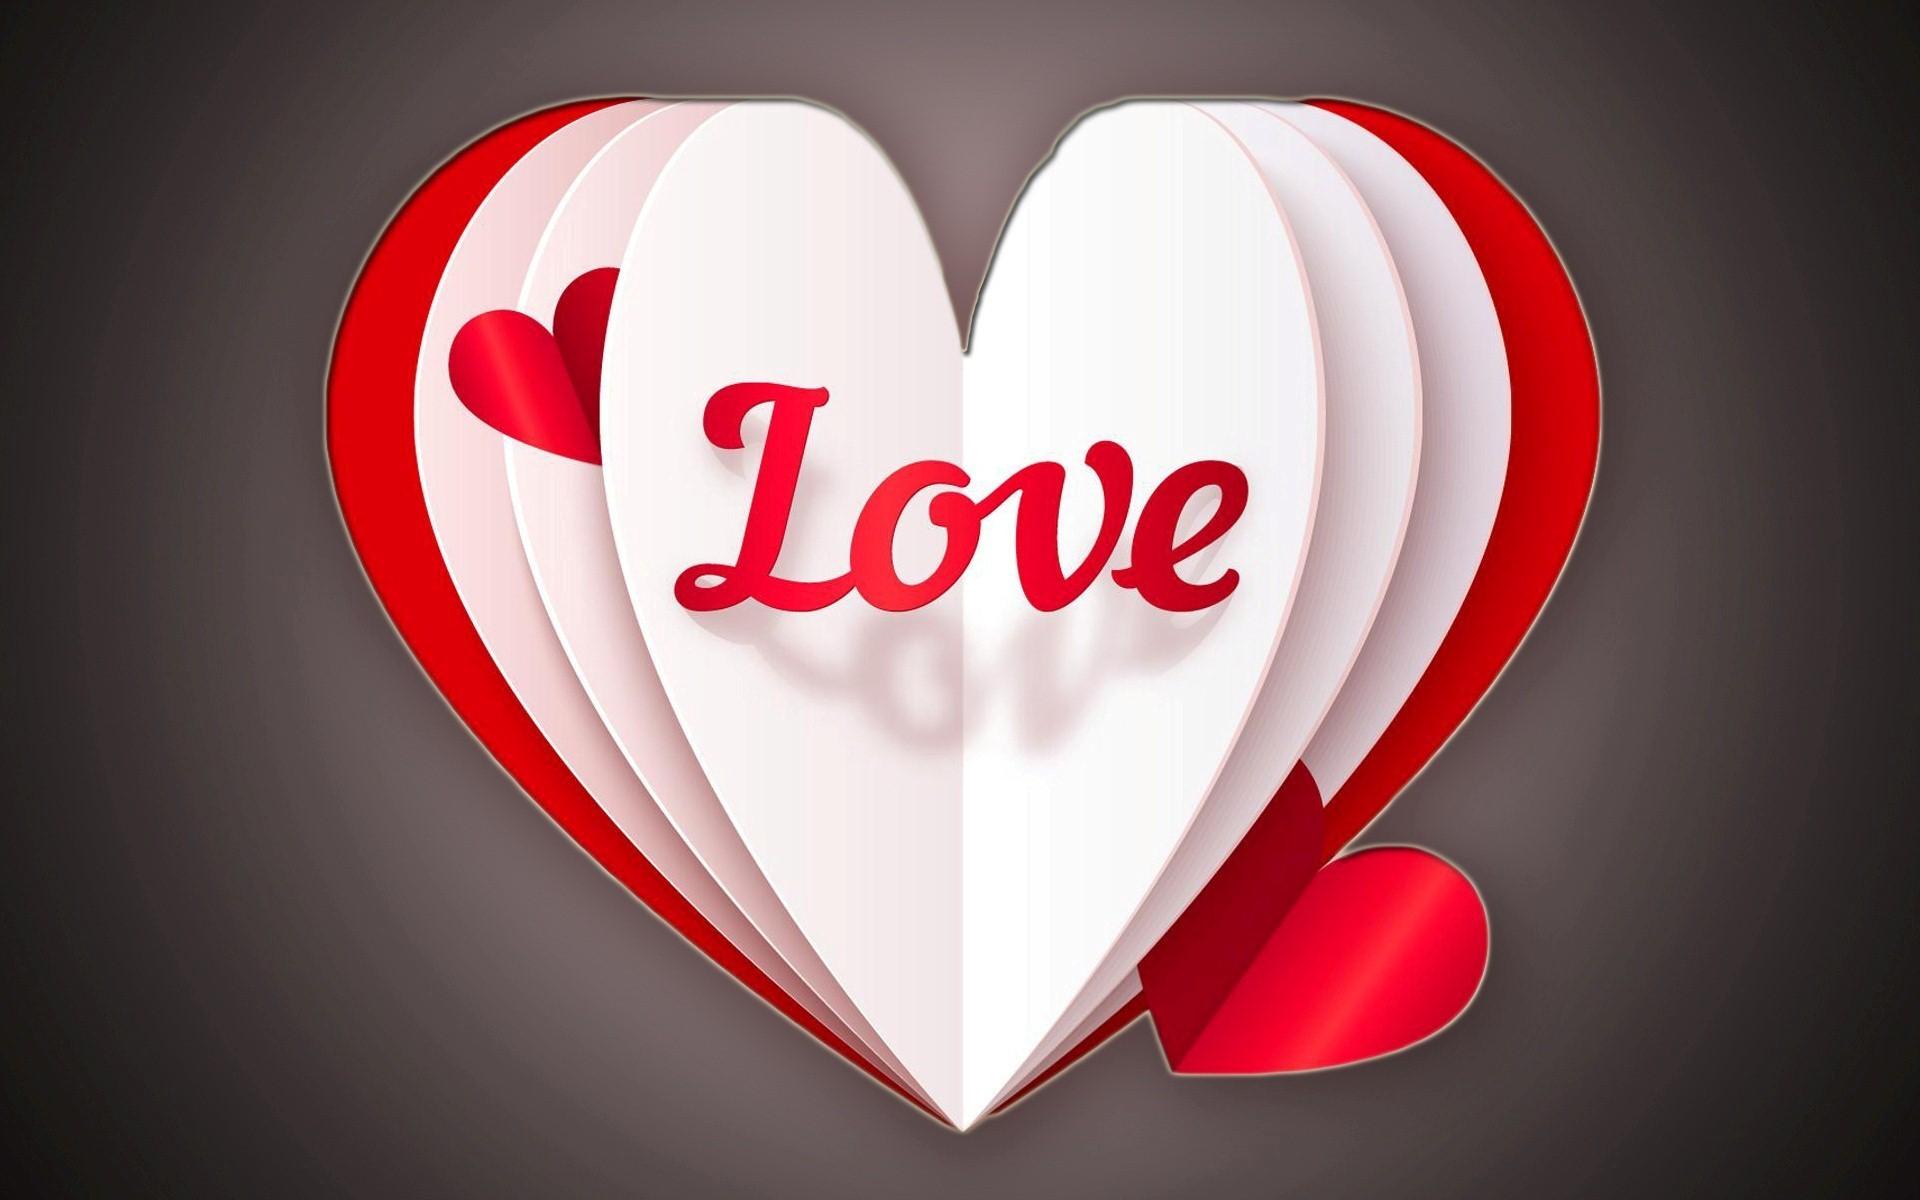 Love Heart Wallpaper 60+ images